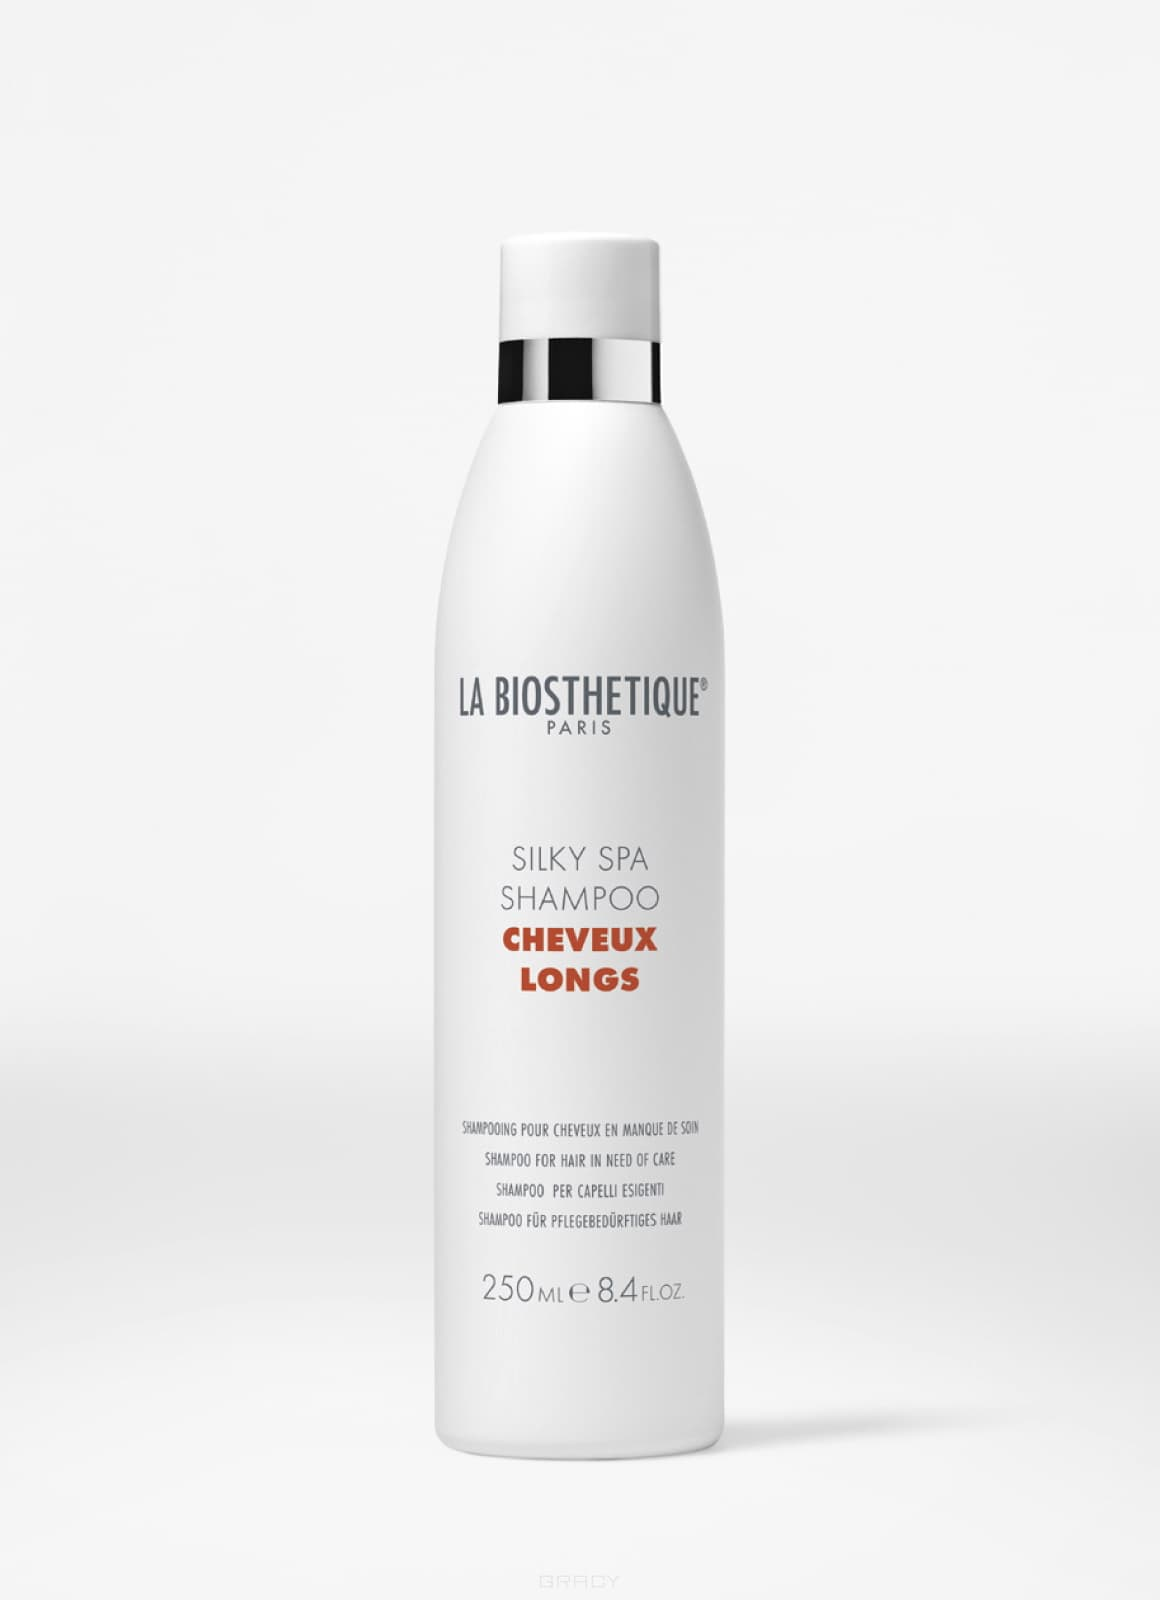 La Biosthetique, SPA-шампунь для придания шелковистости длинным волосам Silky Spa Shampoo, 450 мл la biosthetique spa спрей для придания гладкости волосам detangling spa spray 200 мл